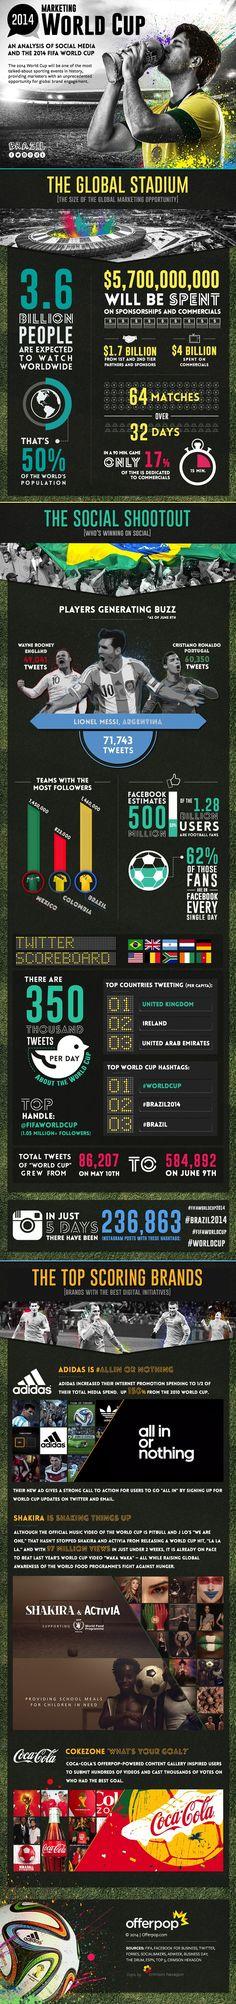 Who's winning the #WorldCup Social Media Marketing battle? - Social Media, Facts  Statistics [INFOGRAPHIC] world cup 2014, worldcup, cup mania, cup market